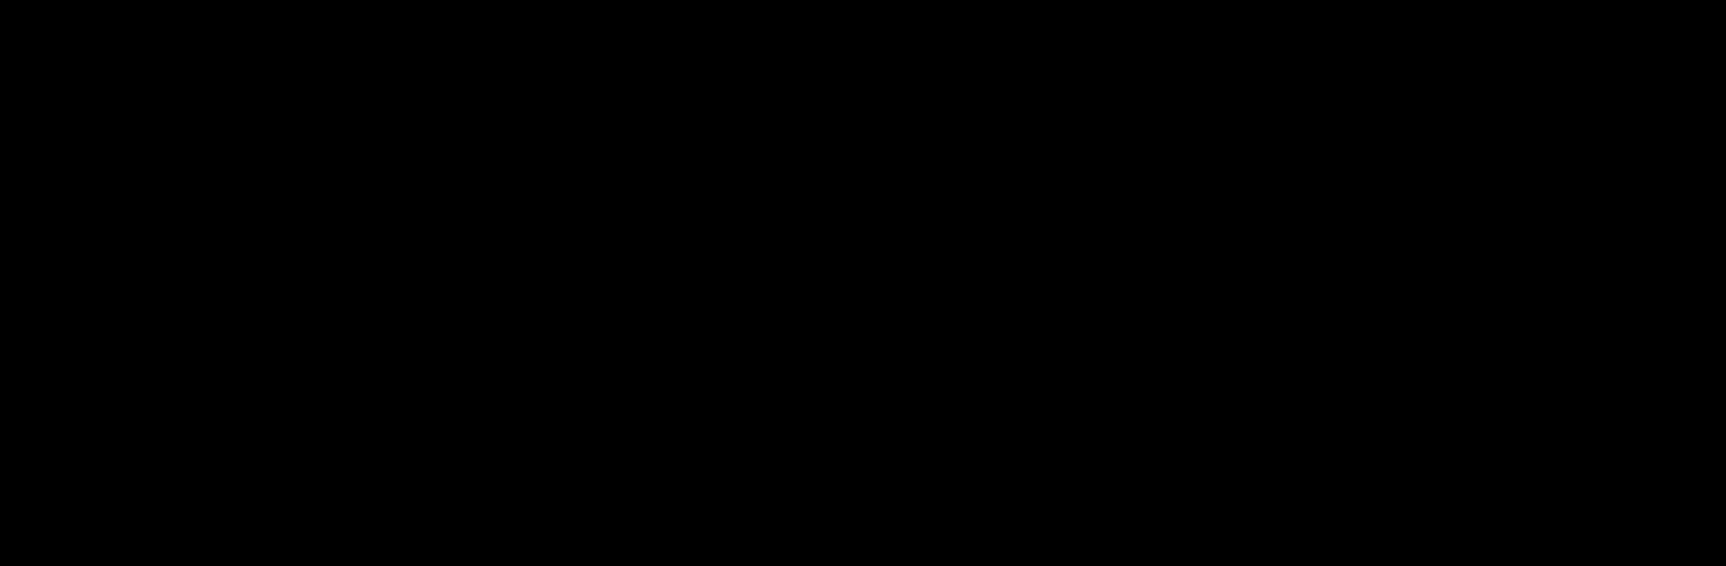 SB-366791